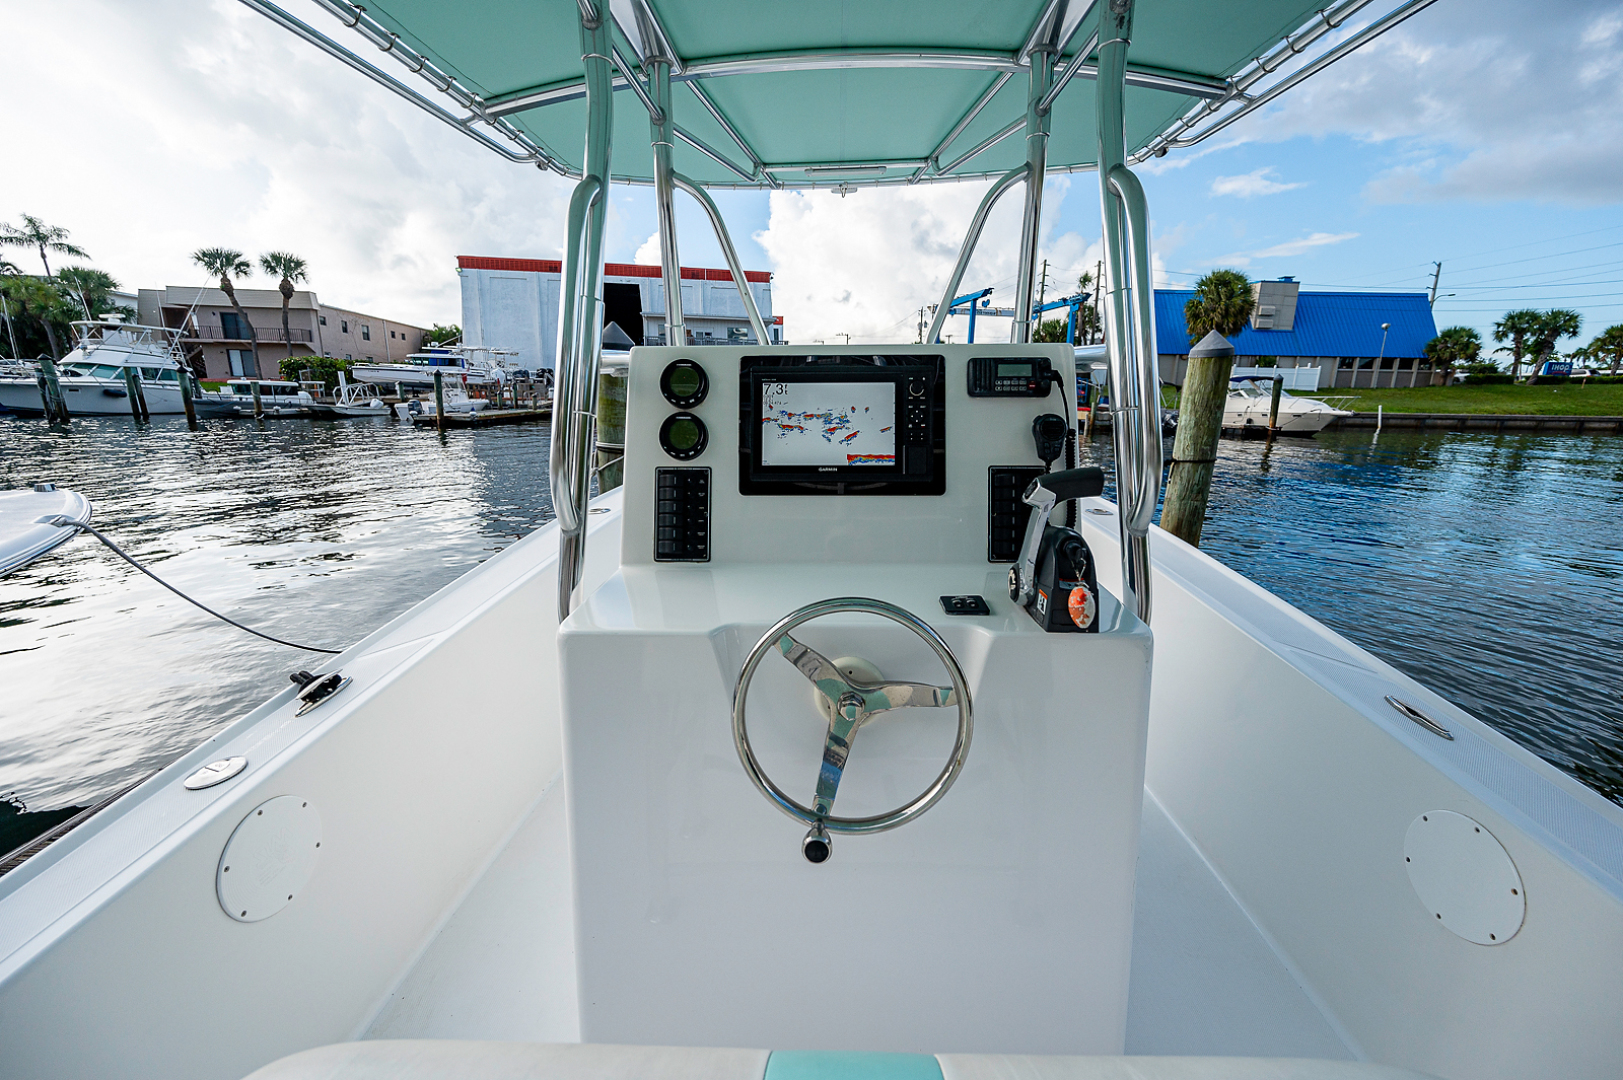 Ocean Master 2013-27 Ocean Master Palm Beach-Florida-United States-Helm-1501369 | Thumbnail